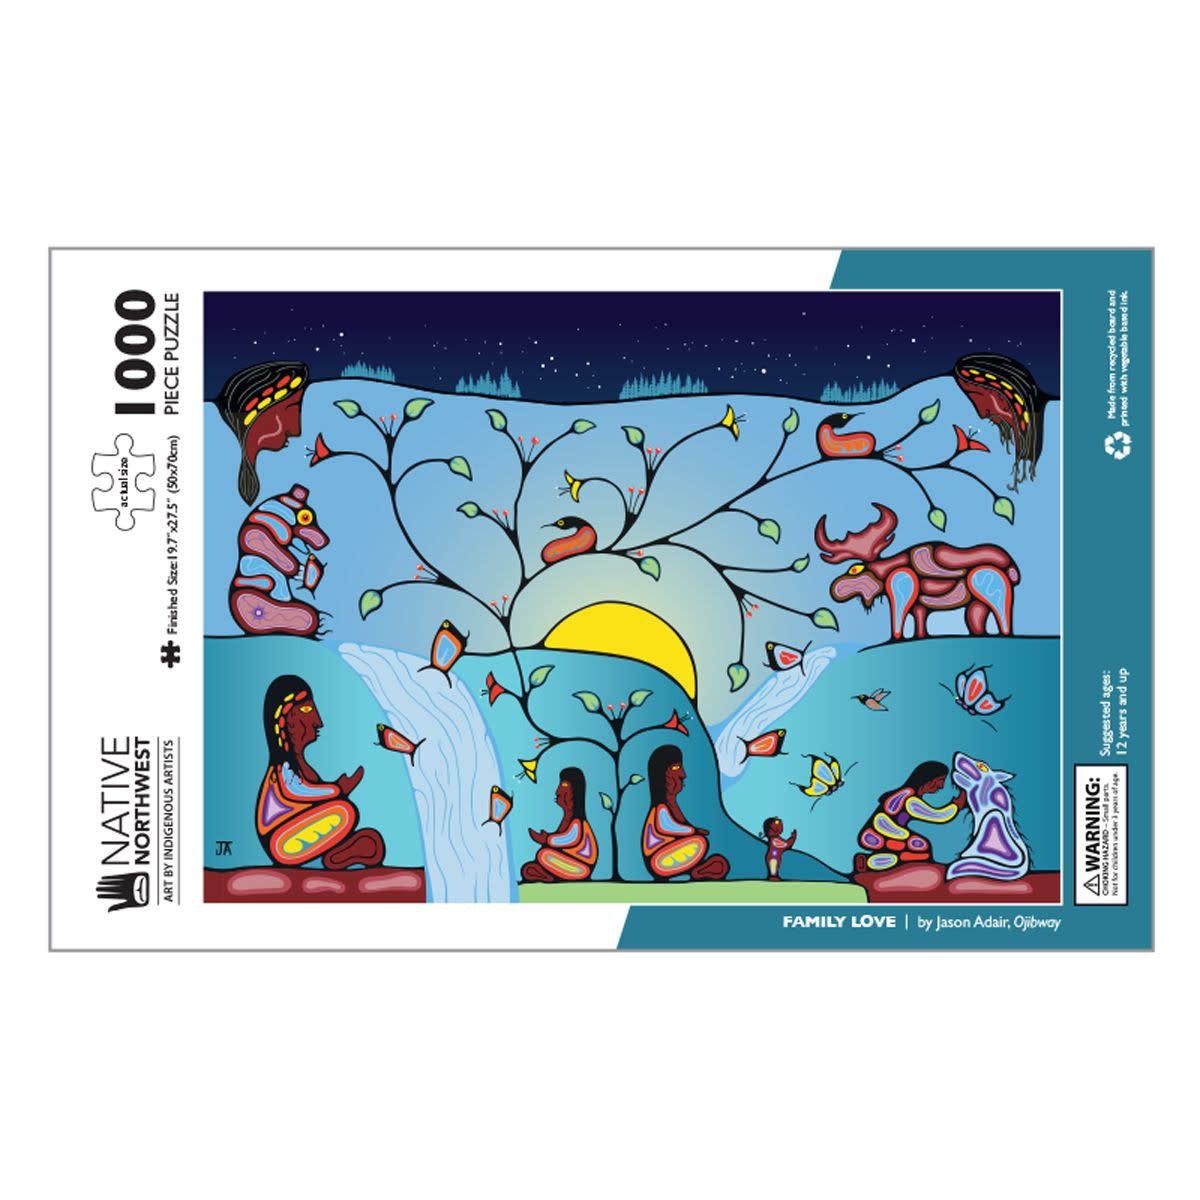 1000 pcs Puzzle - Family Love by Jason Adair-2